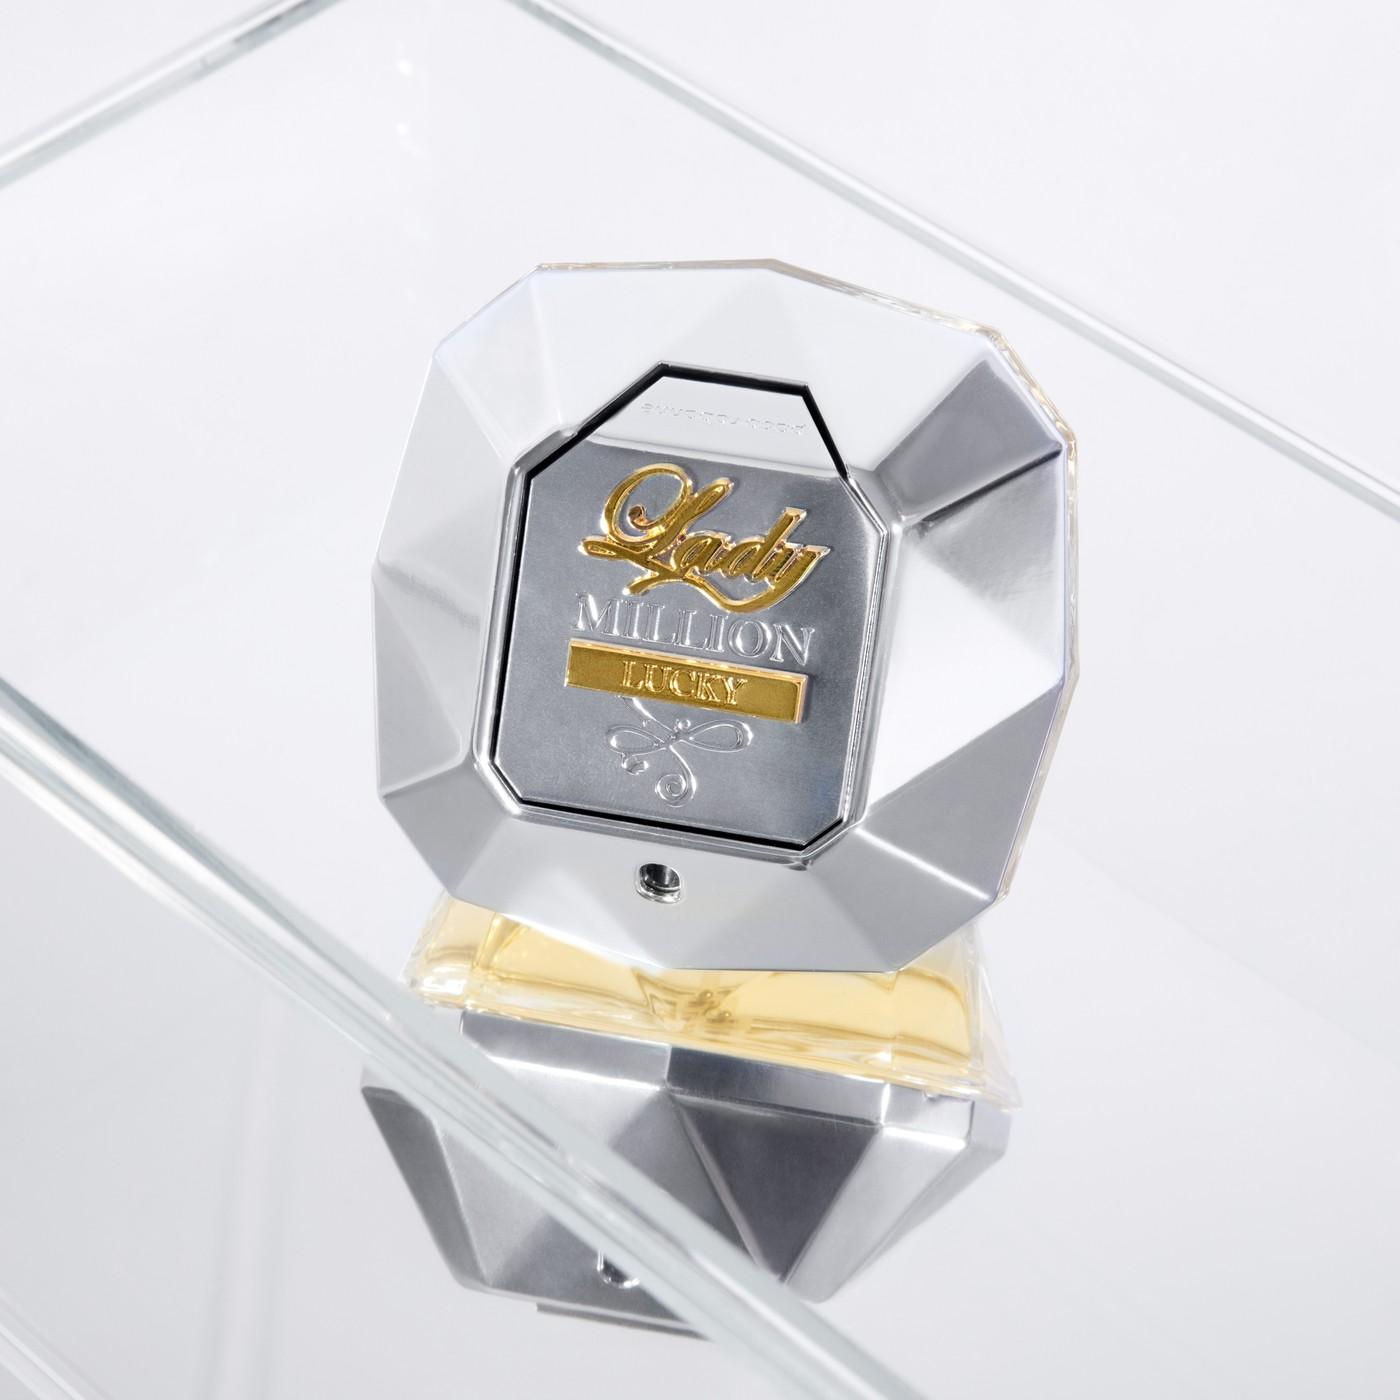 Lady Million Lucky Paco Rabanne - Perfume feminino Eau de Parfum 30ml